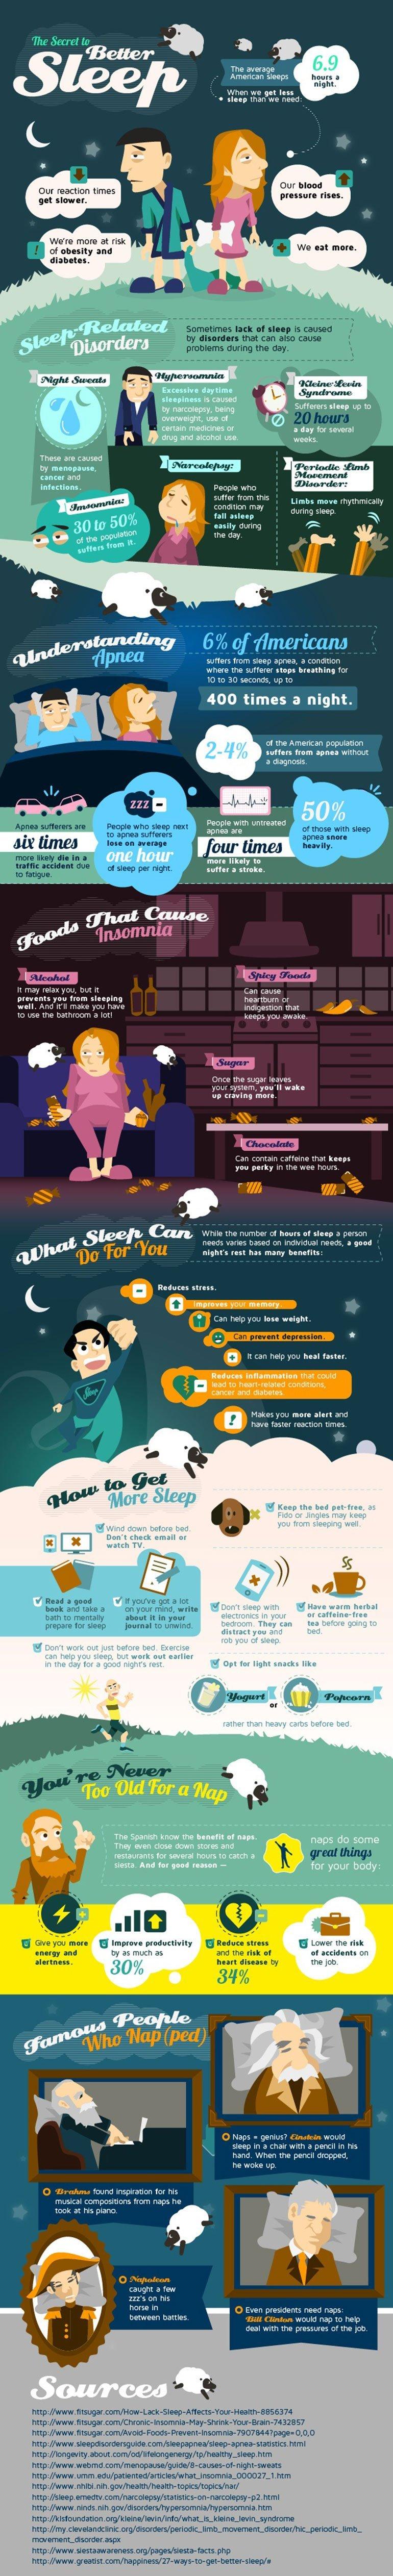 better-sleep-infographic